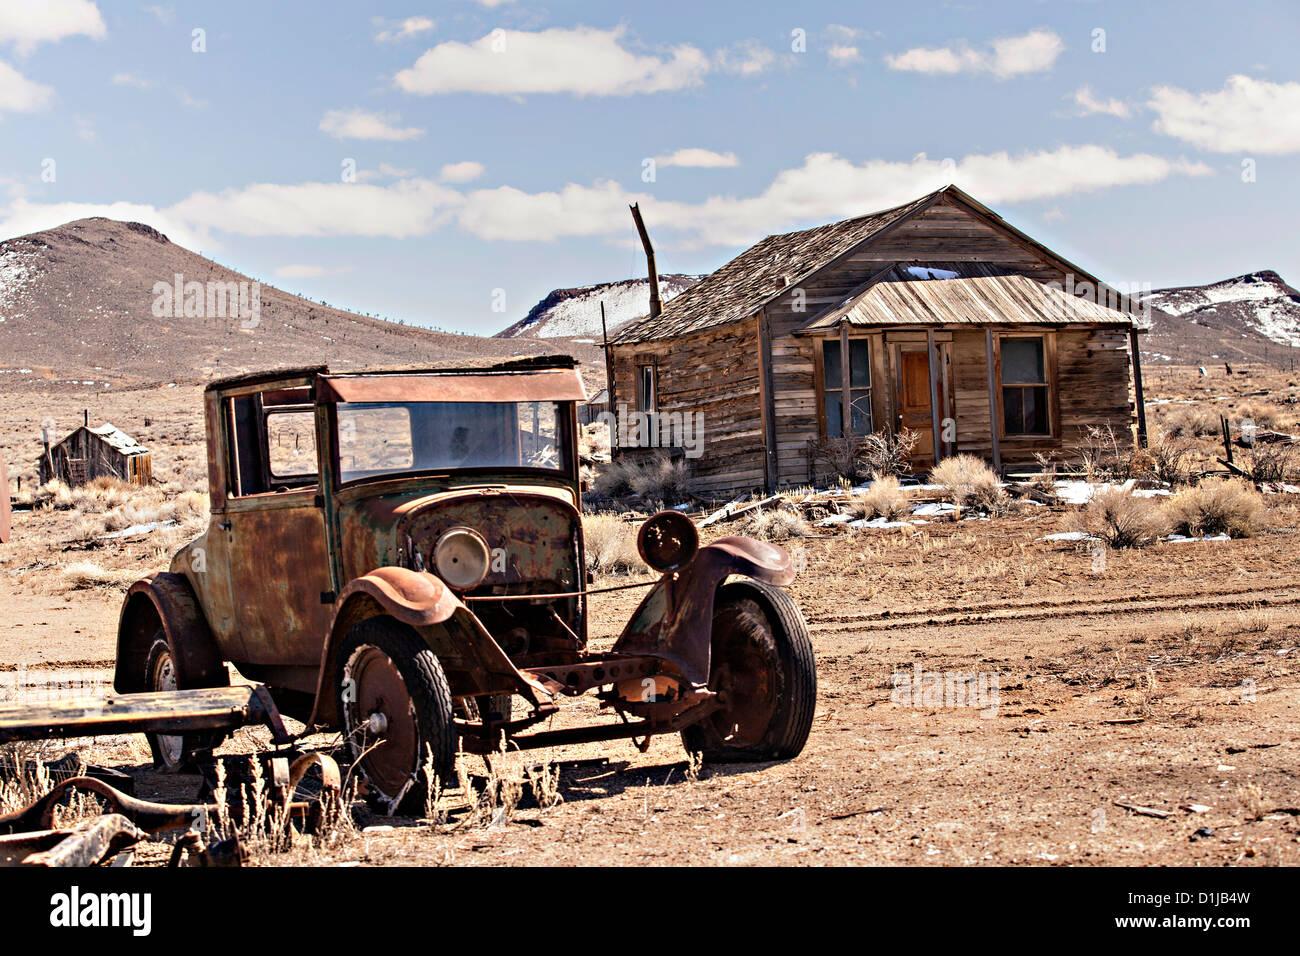 Buy Car In Usa Texas